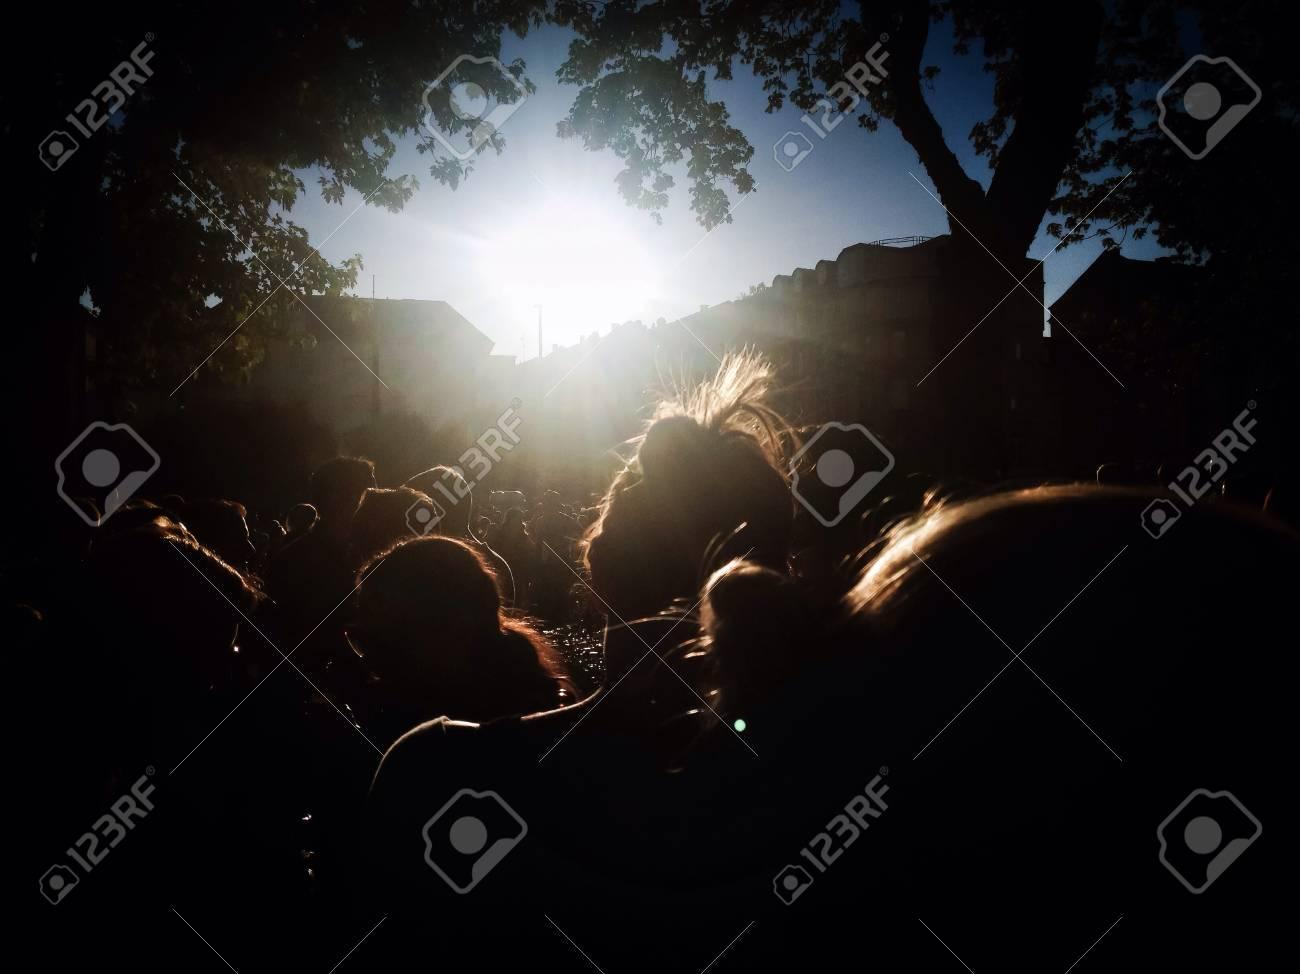 Crowd - 28613910